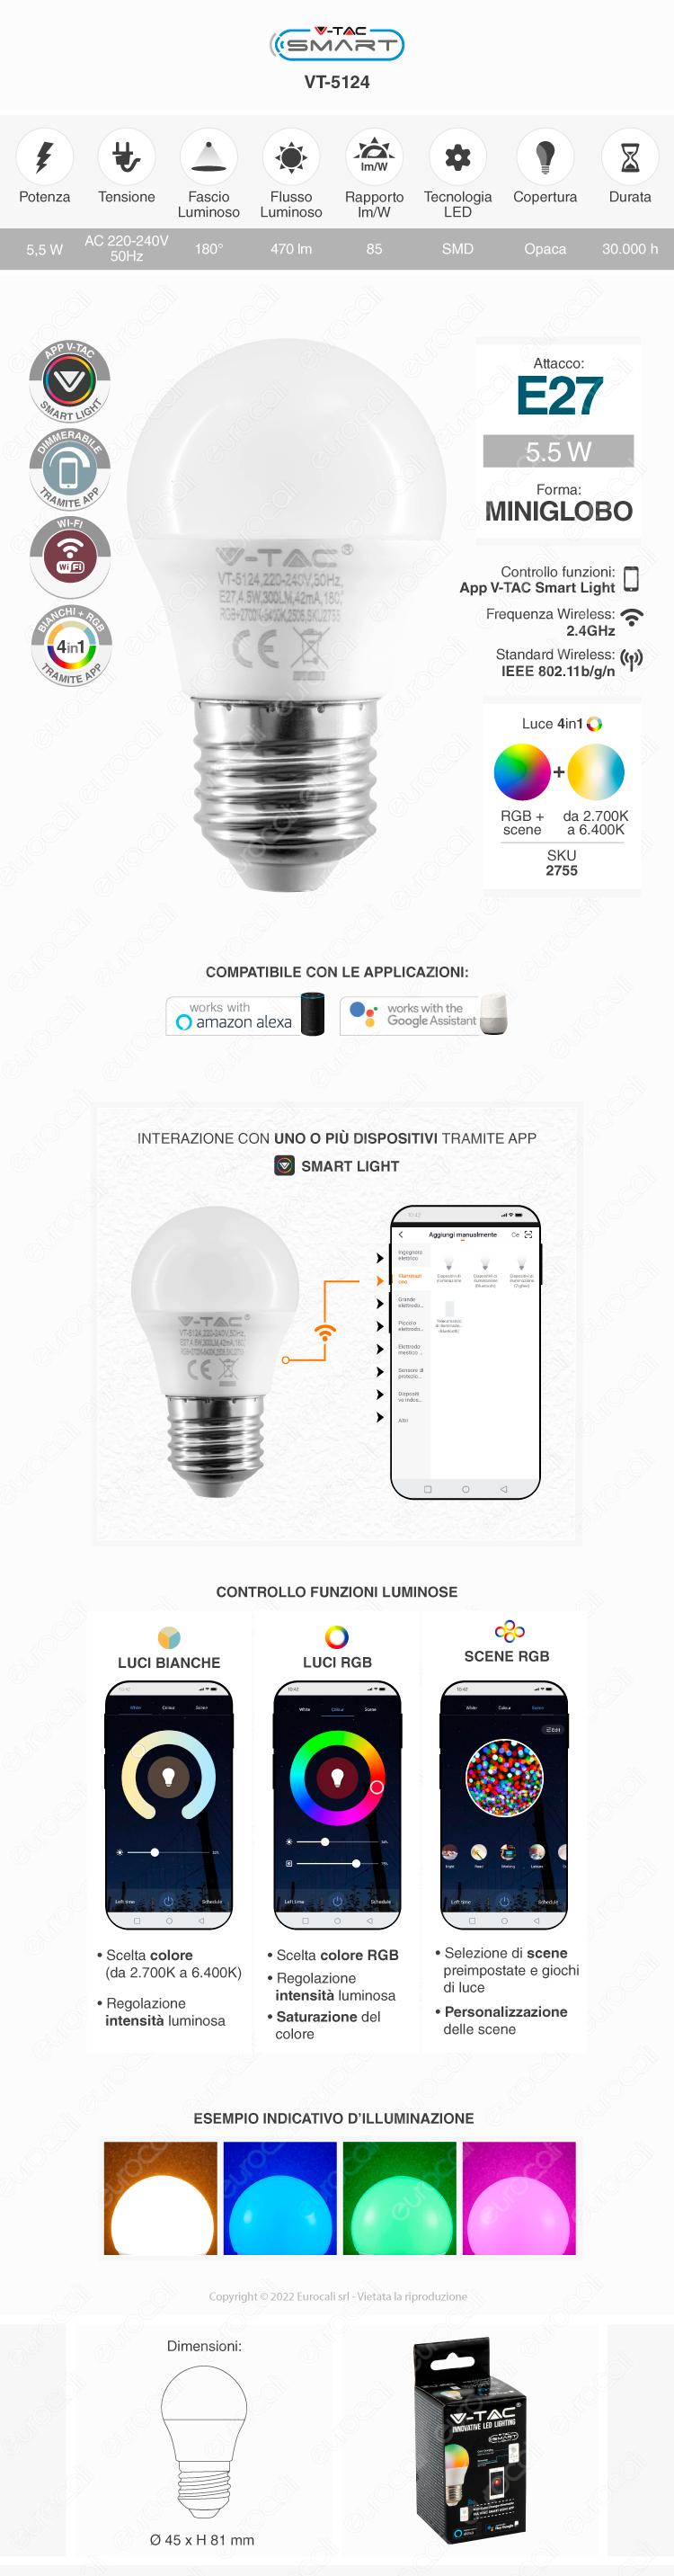 V-Tac Smart VT-5124 Lampadina LED Wi-Fi E27 4,5W MiniGlobo G45 RGB+W Dimmerabile